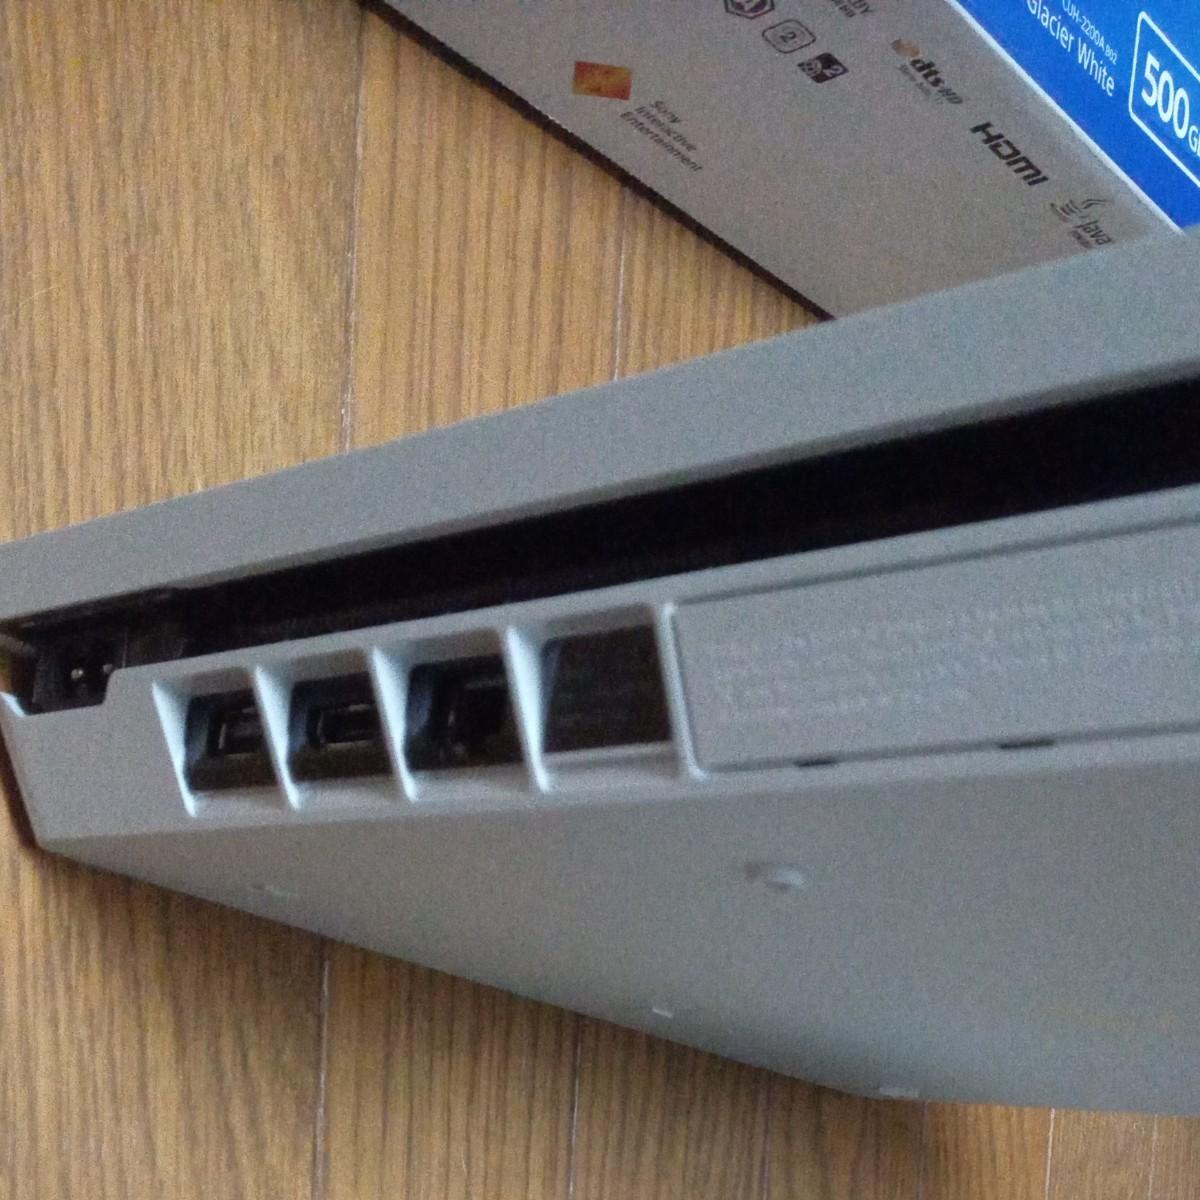 PlayStation4 グレイシャー・ホワイト 500GB CUH-2200AB02 完品+ 別売コントローラー